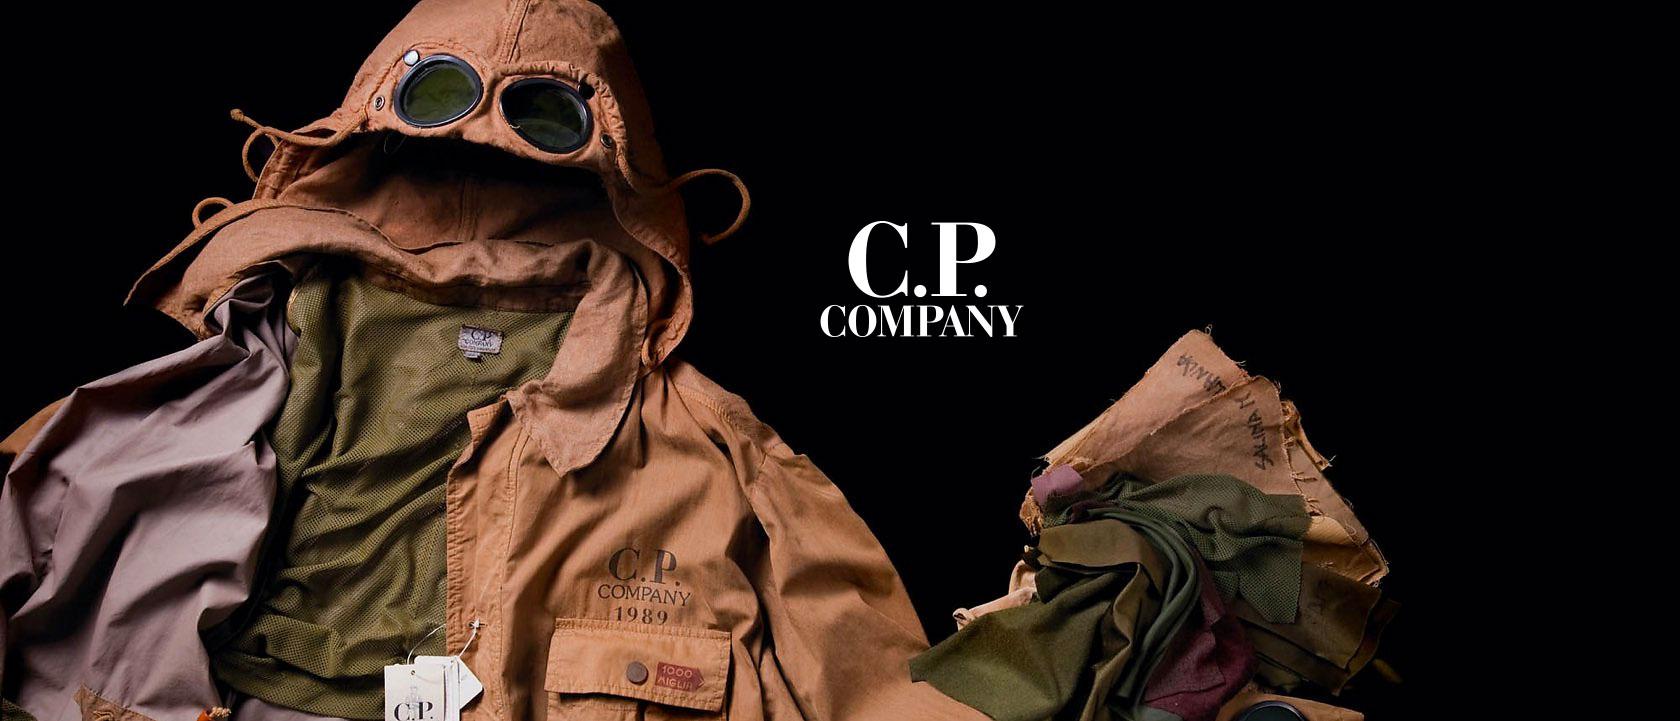 C.P.COMPANY TRYMEETING